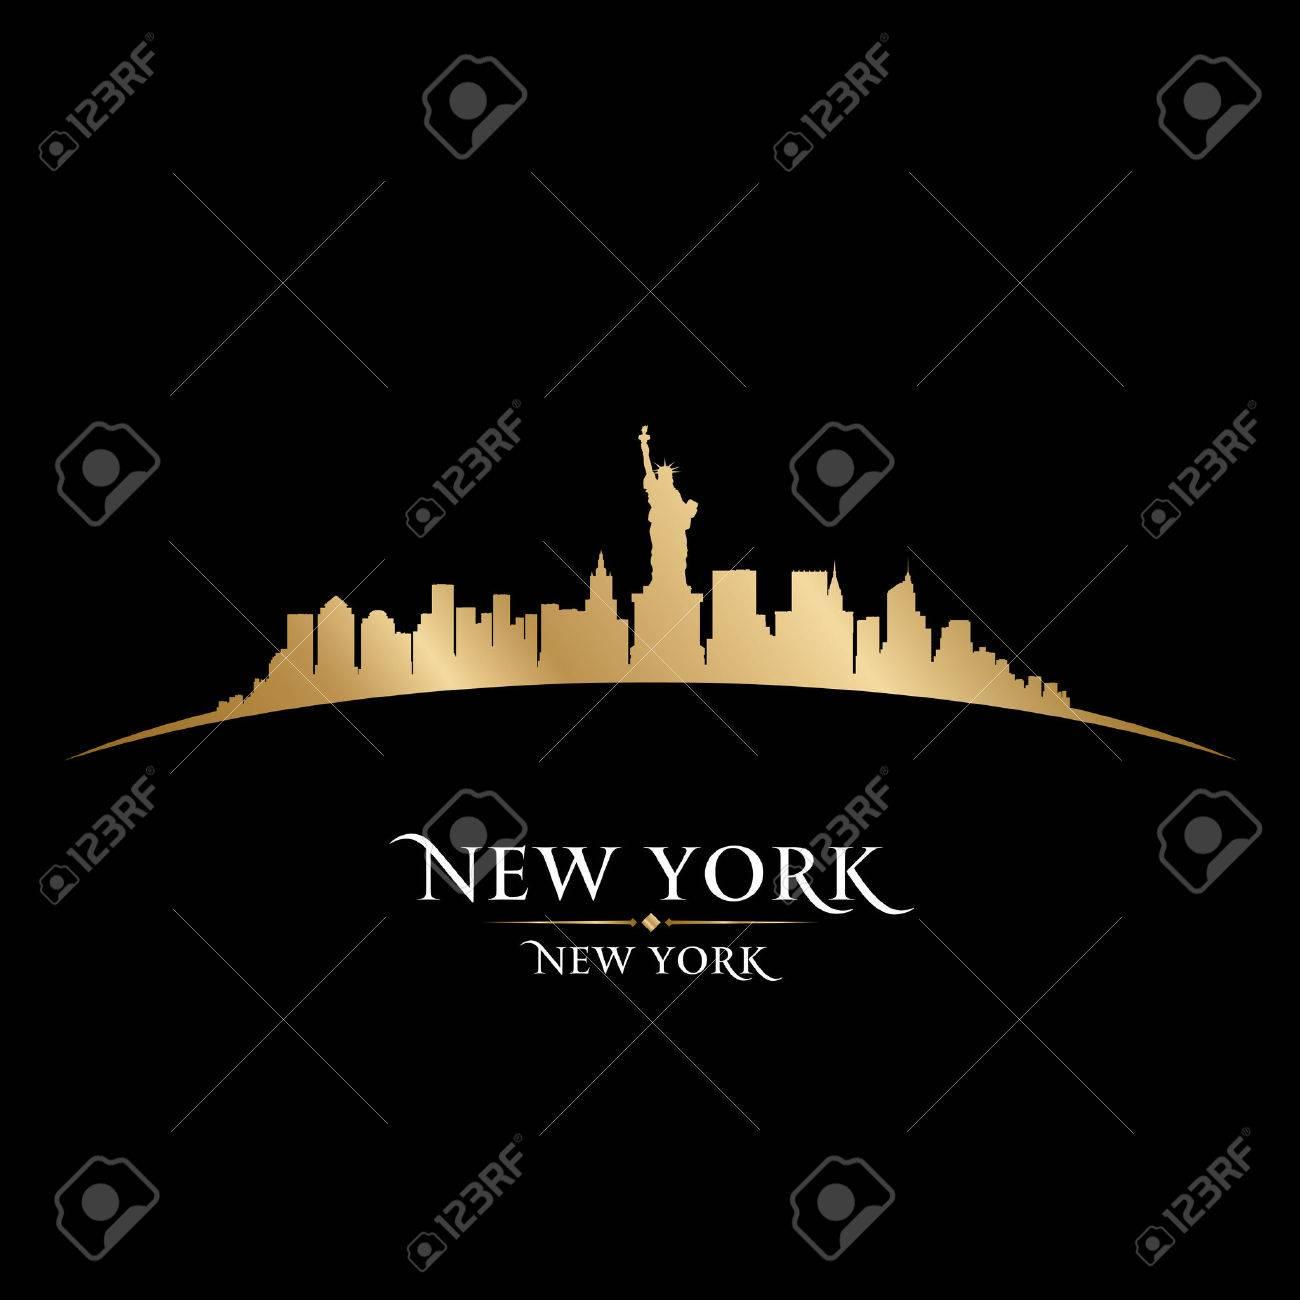 New York city skyline silhouette. Vector illustration Stock Vector - 22598679